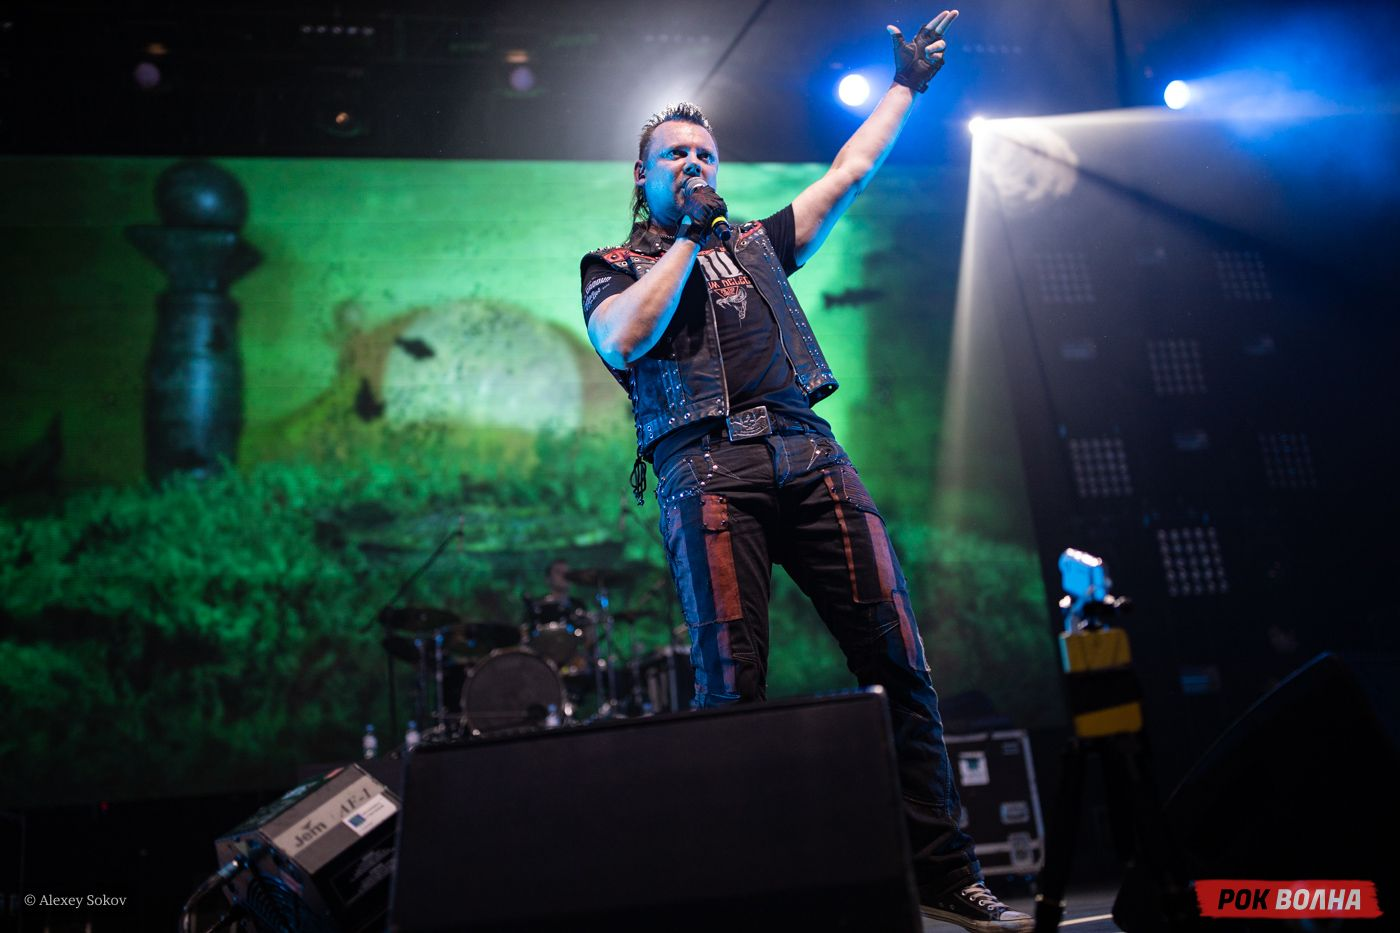 концерт князя в москве 7 августа